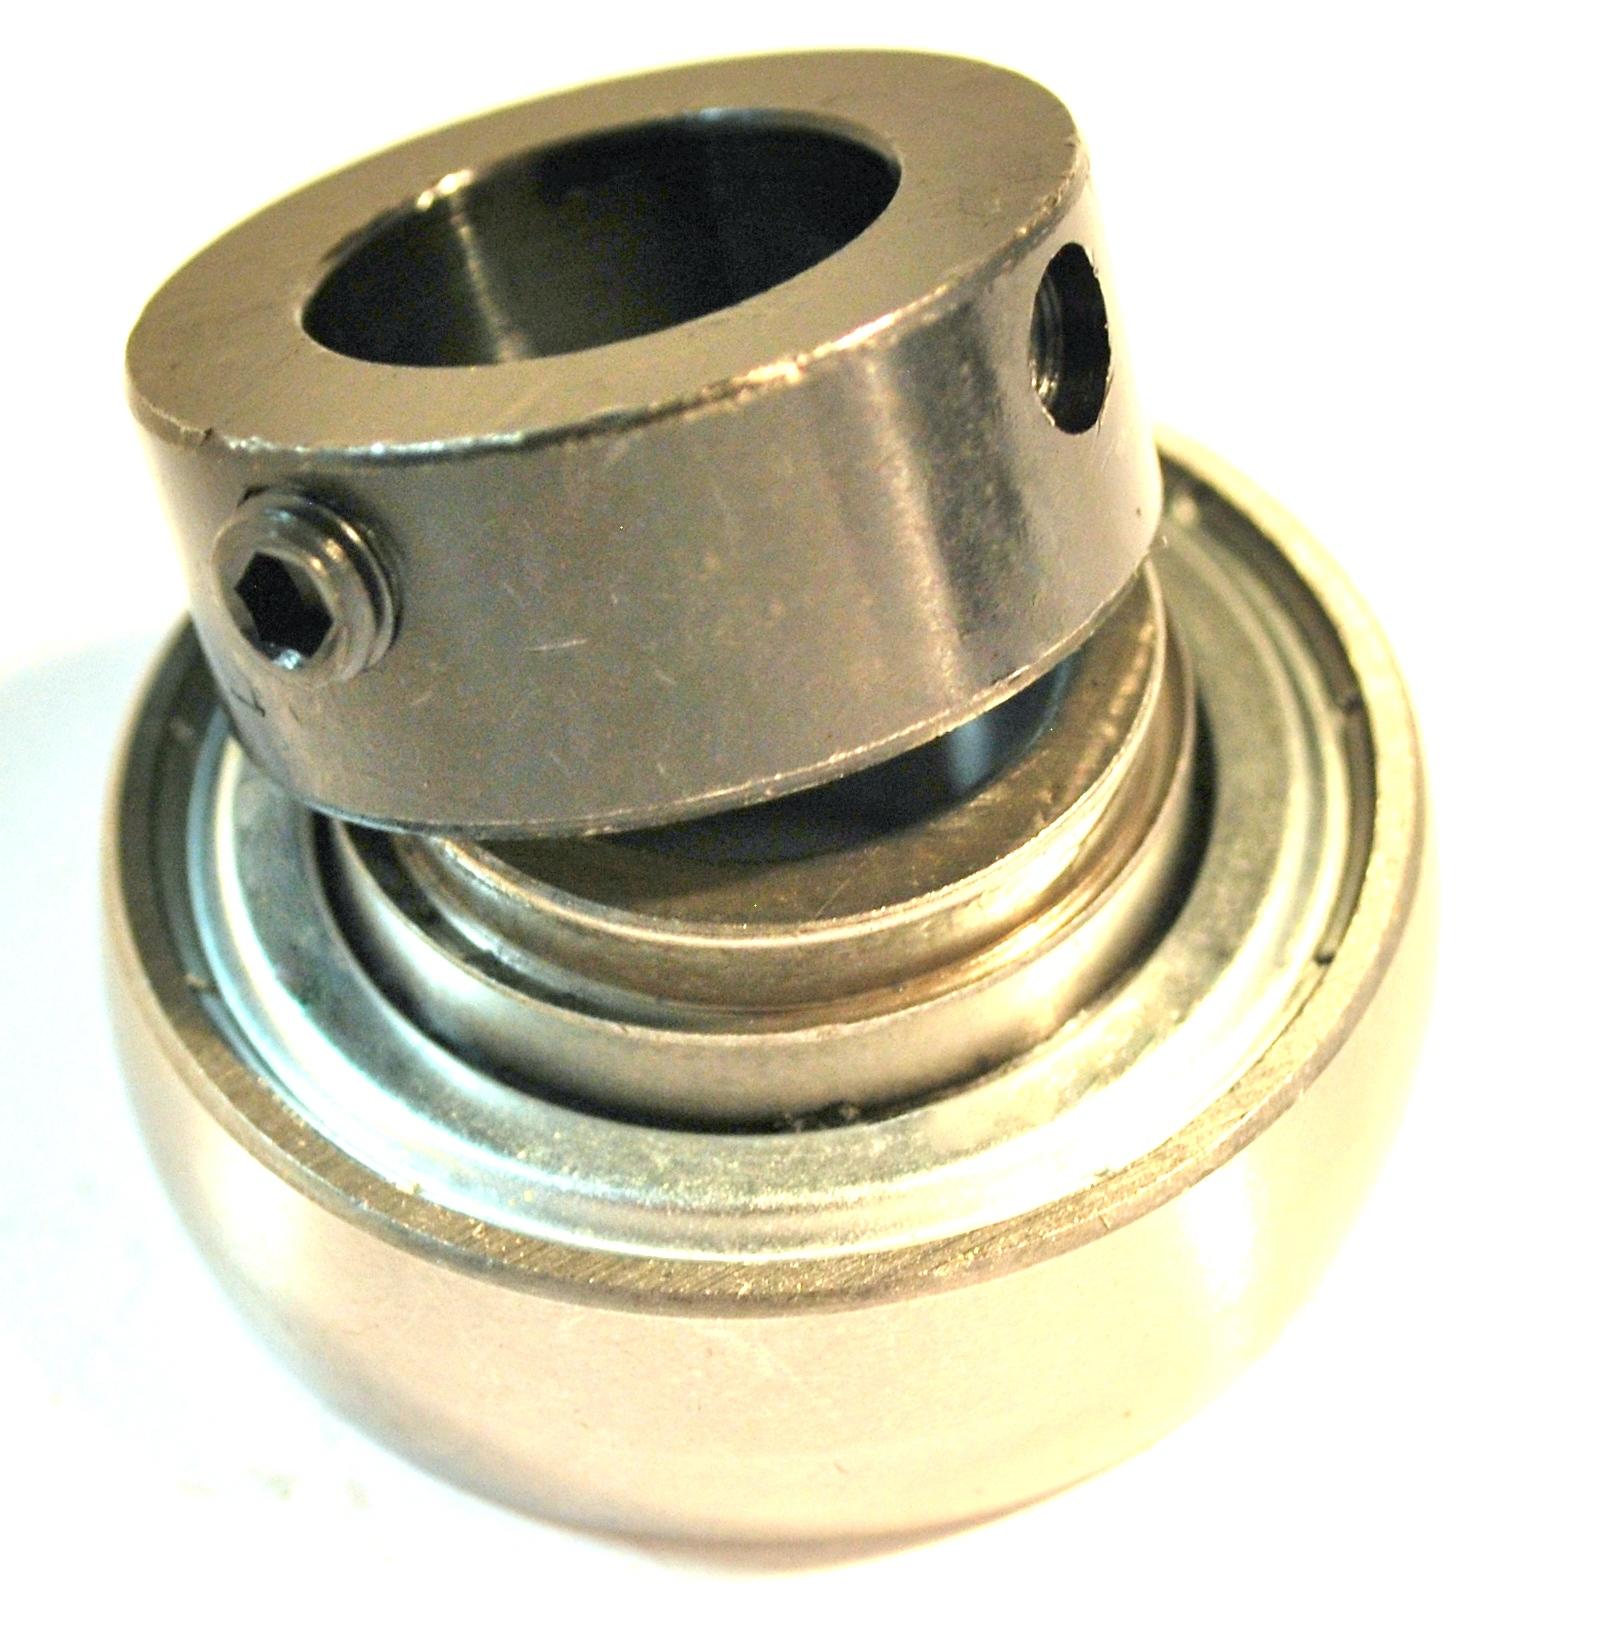 1 2 Quot Insert Bearing With Eccentric Locking Collar Csa201